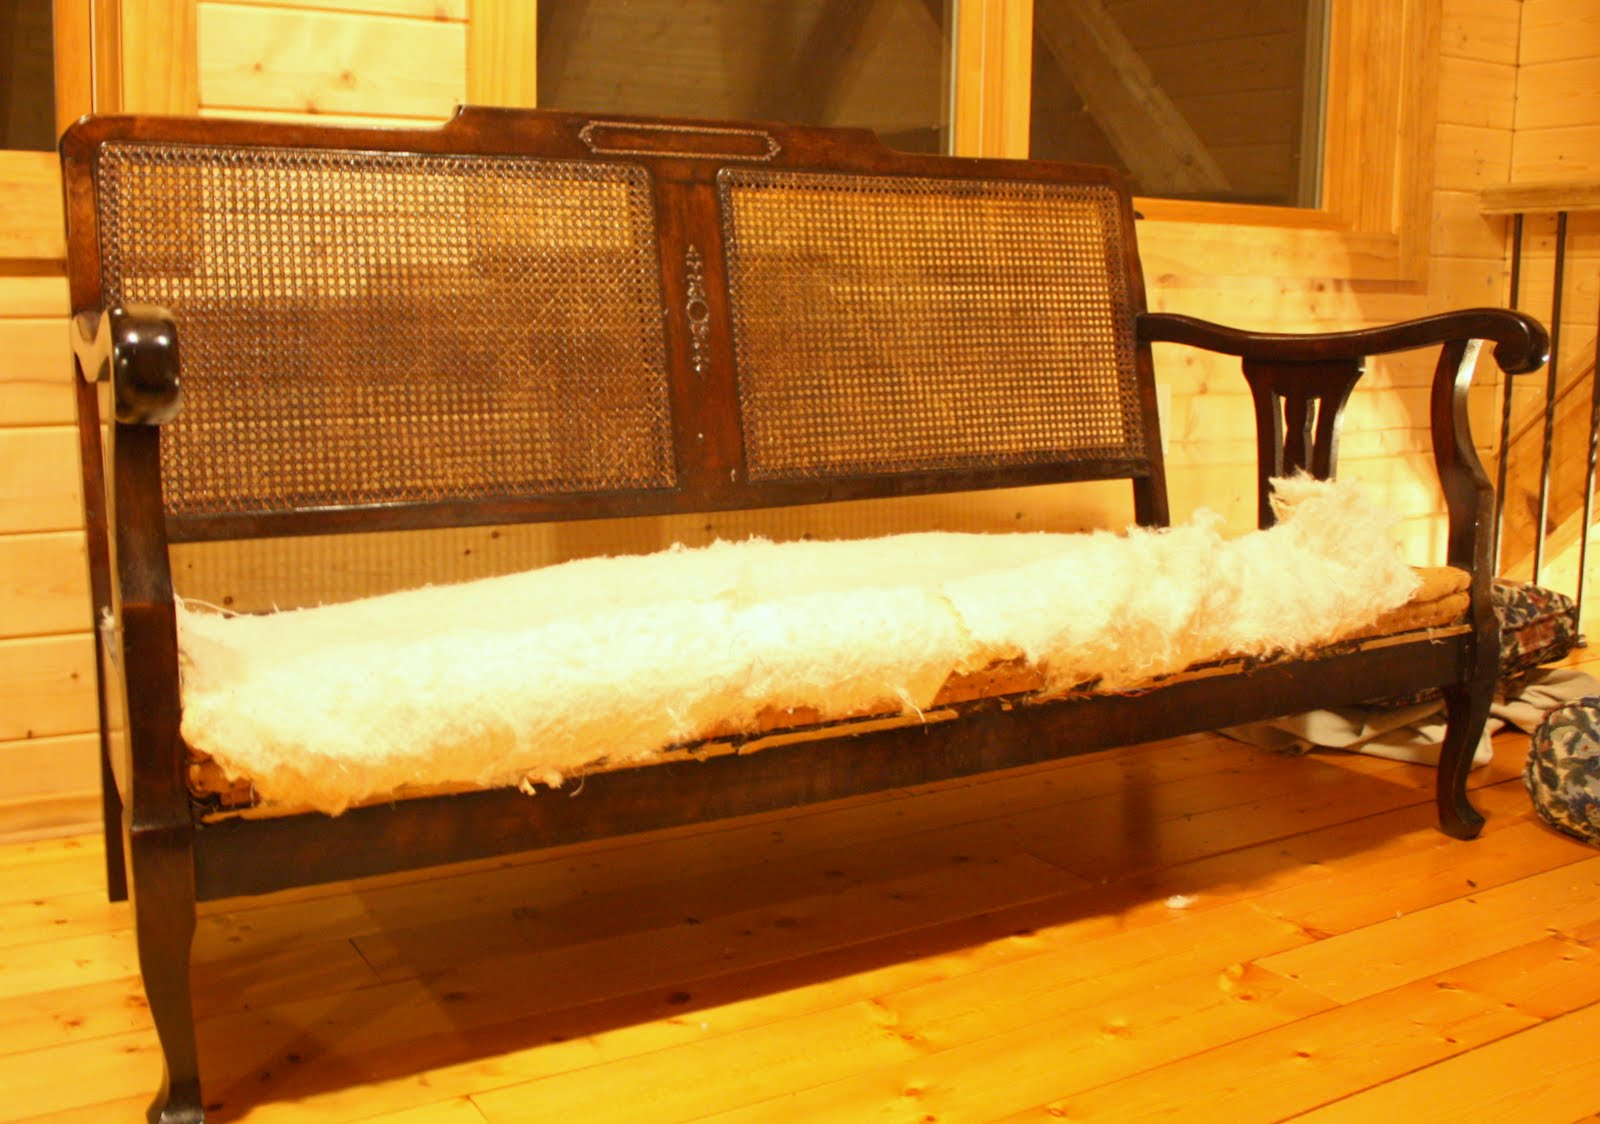 1930 Cane Back Sofa Black Leather Pillows Antique Furniture Foter Thesofa